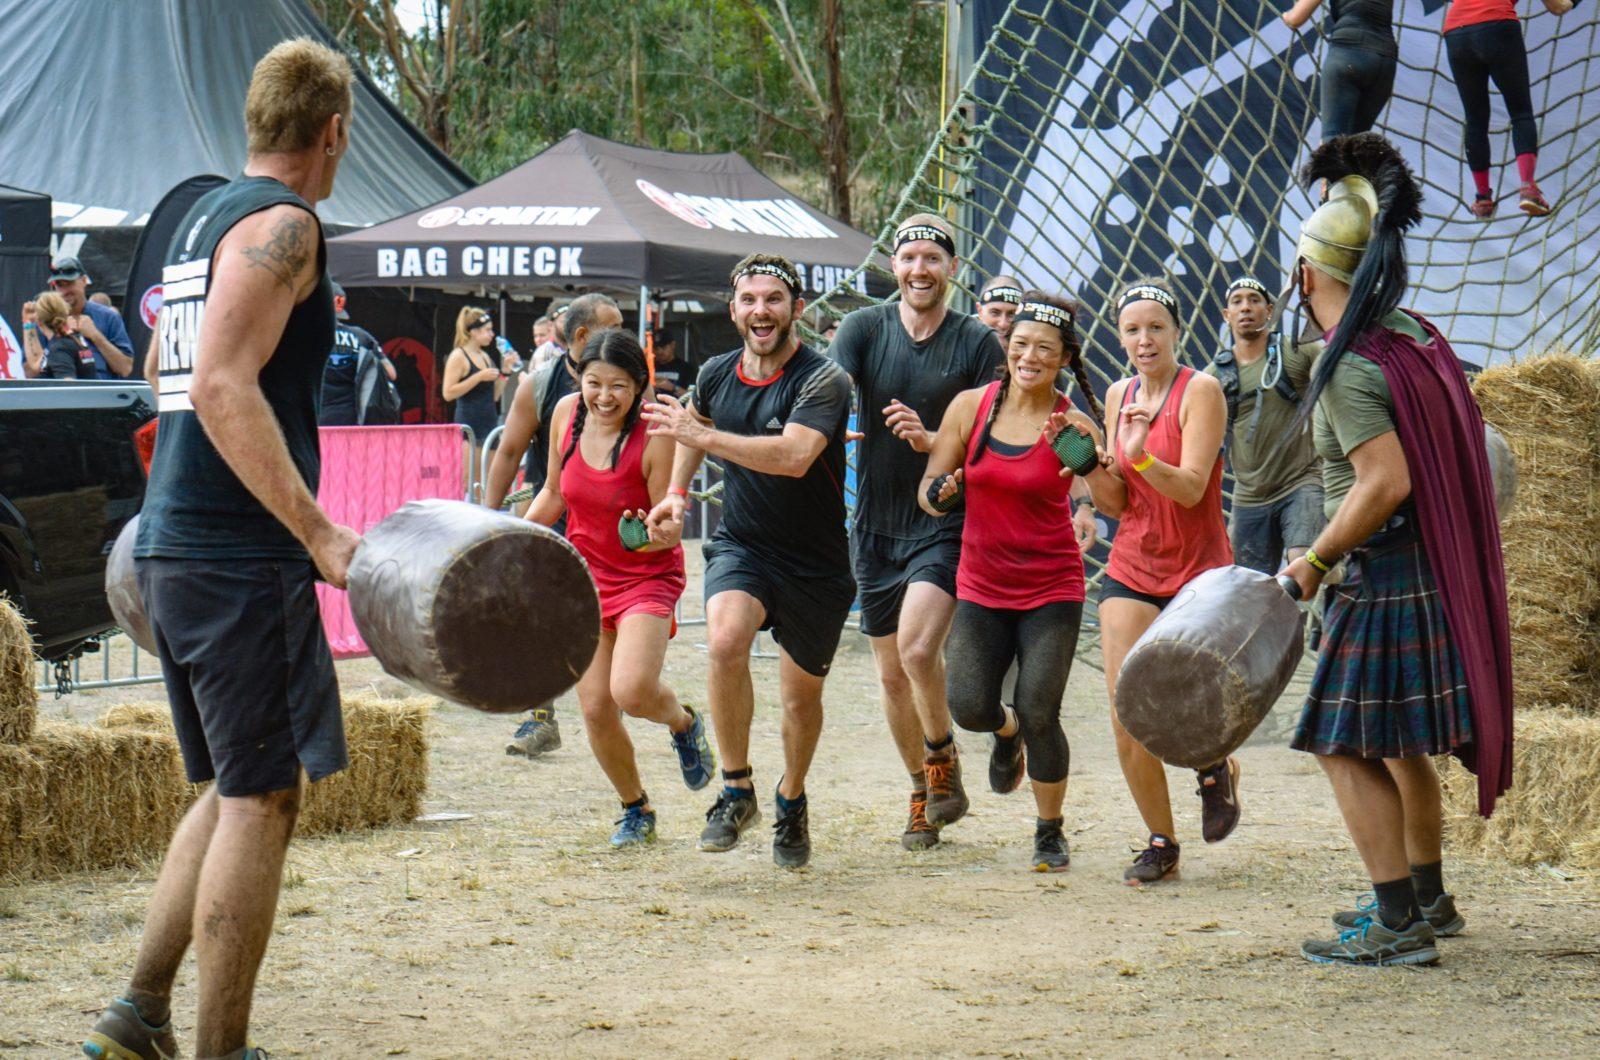 Spartan Australia Racers in action